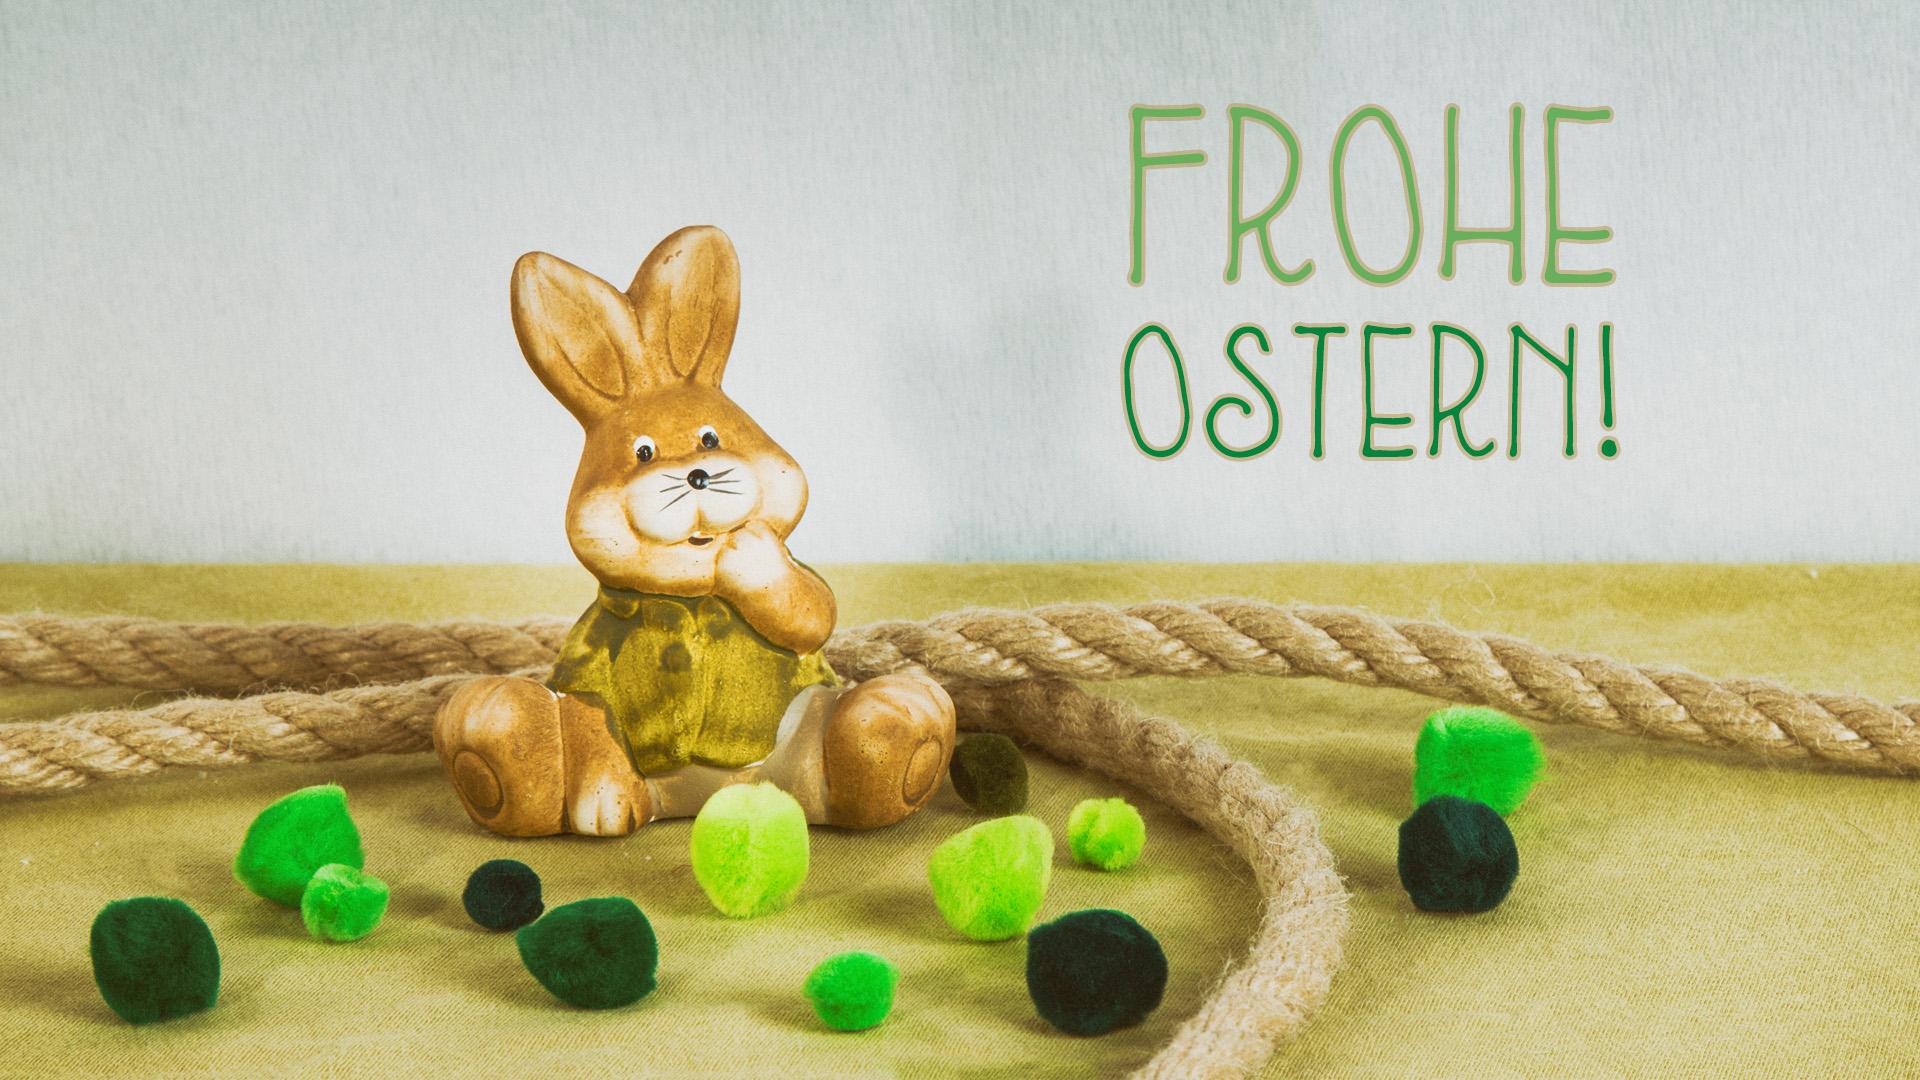 Frohe ostern hintergrundbilder for Wallpaper ostern